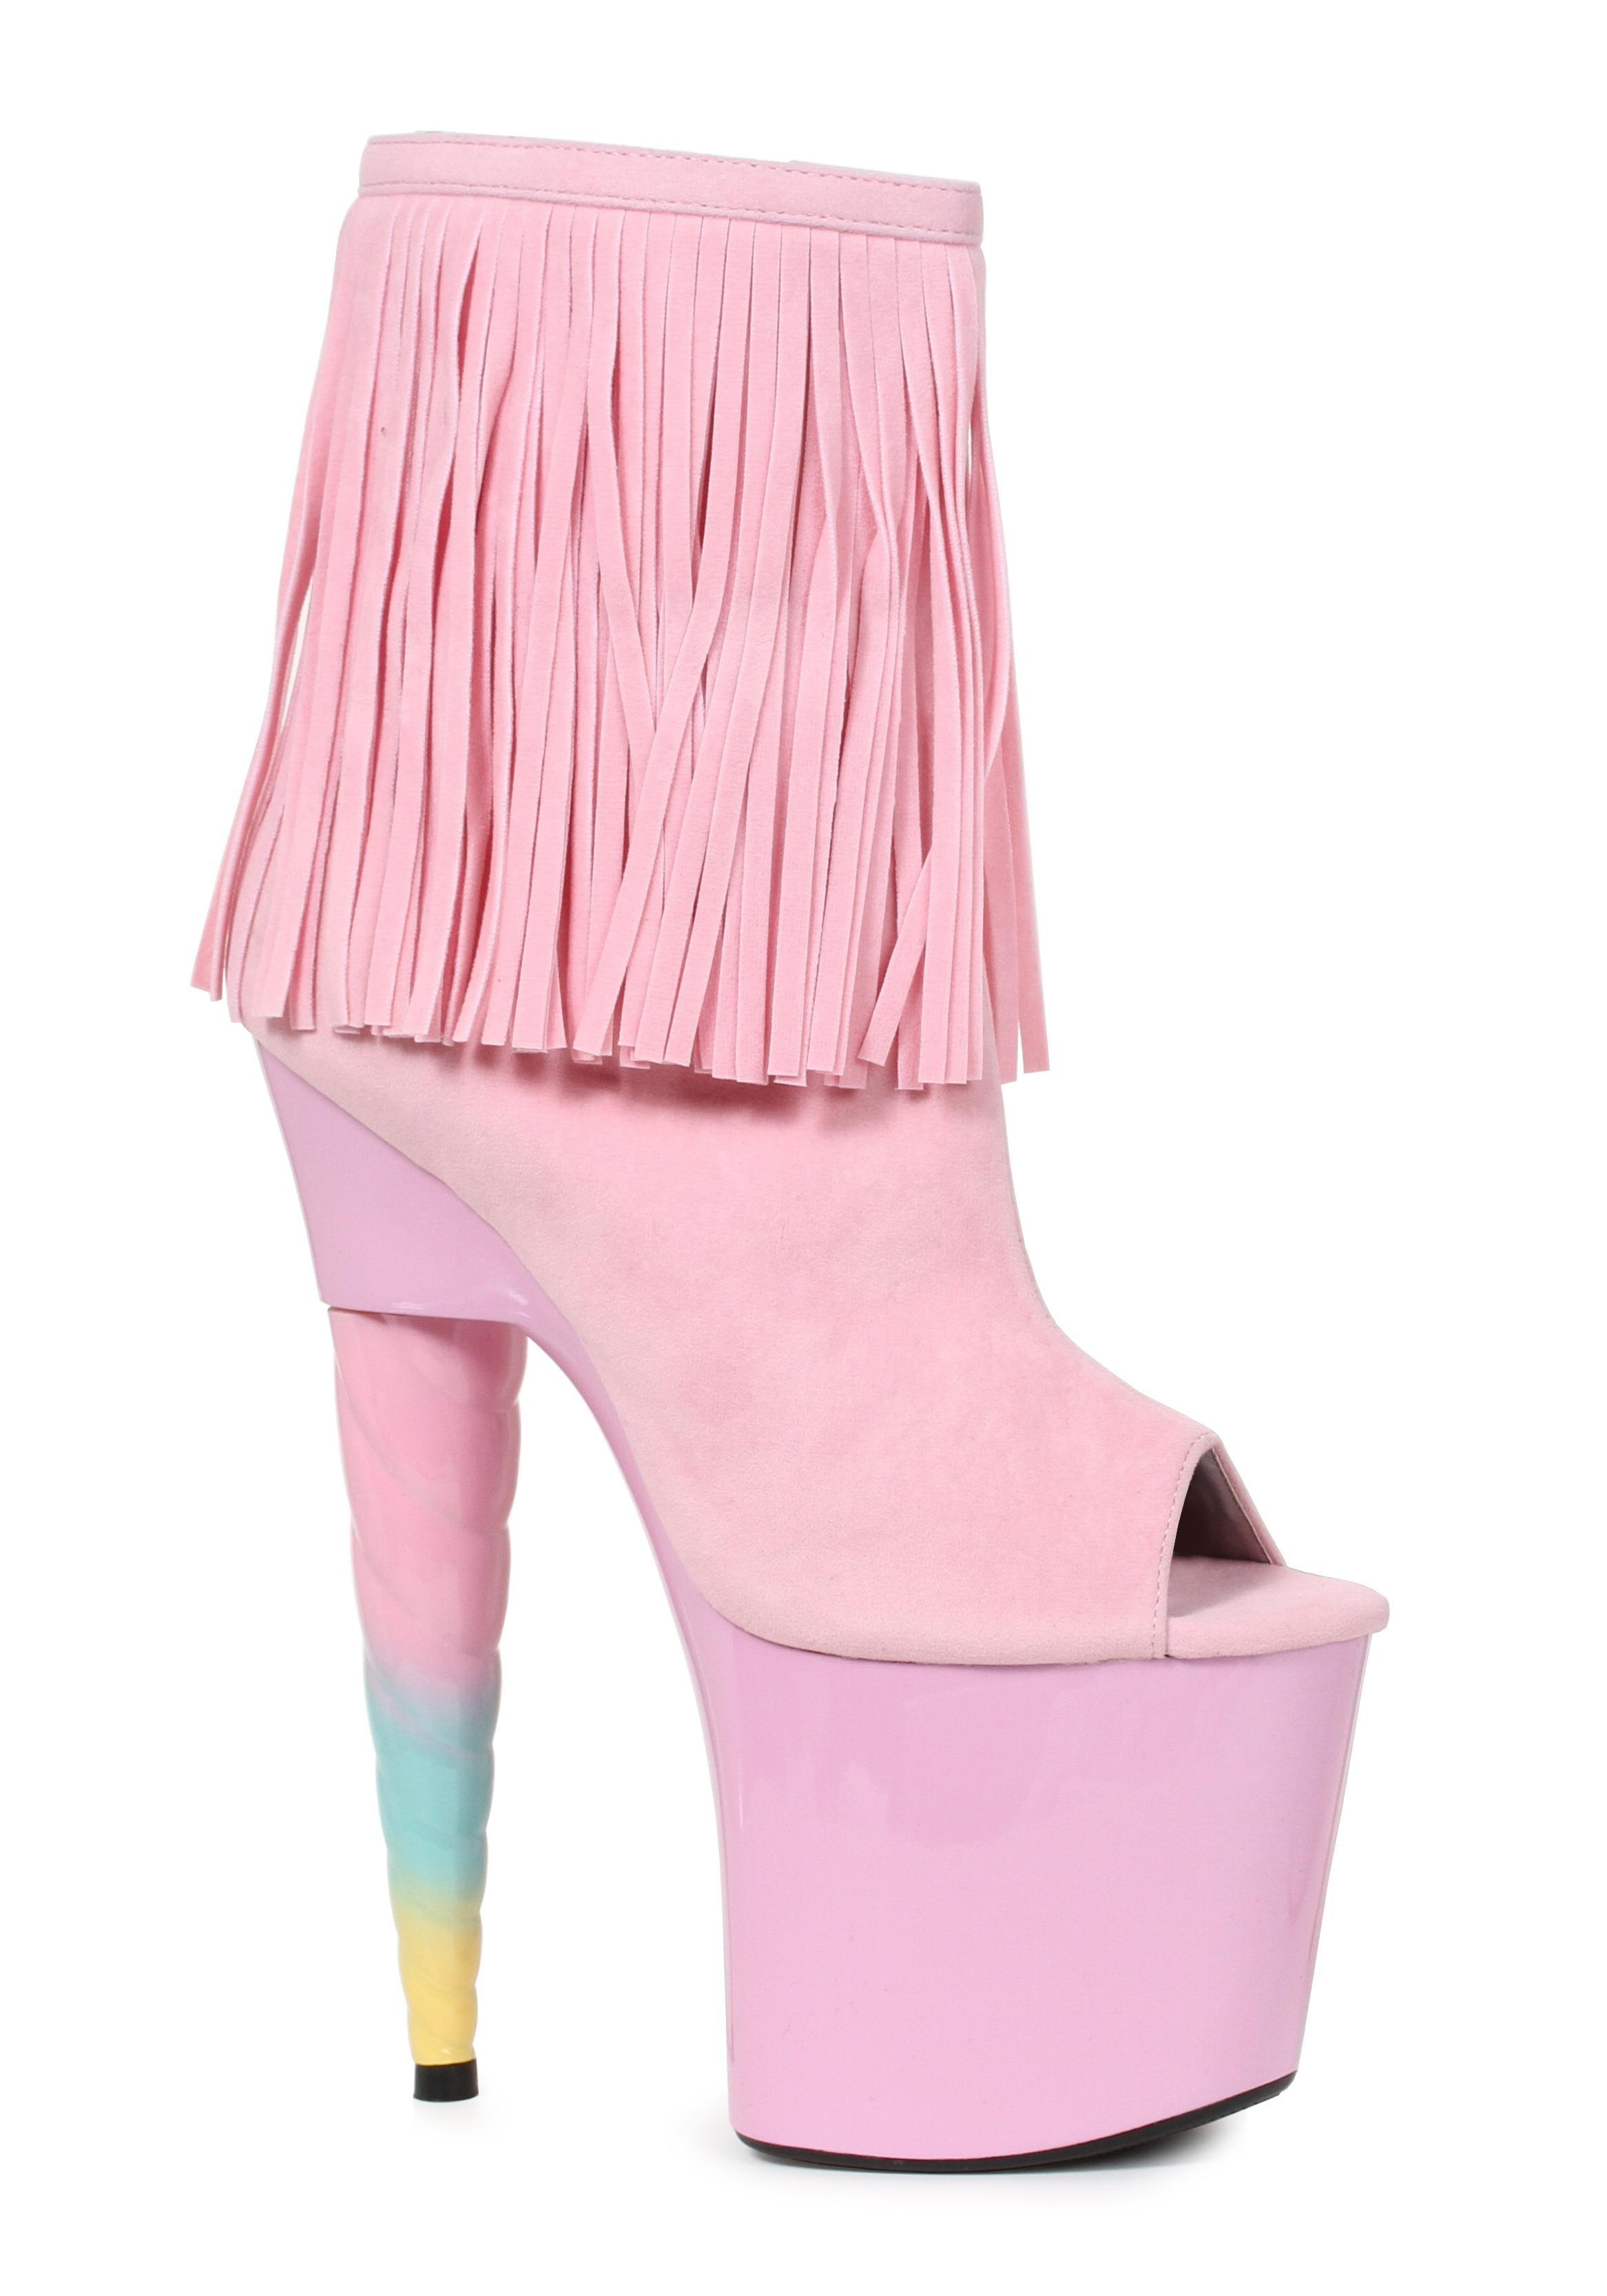 Ellie-Shoes-777-PRINCE-7-Inch-Unicorn-Heel-Platform-Bootie-With-Fringe